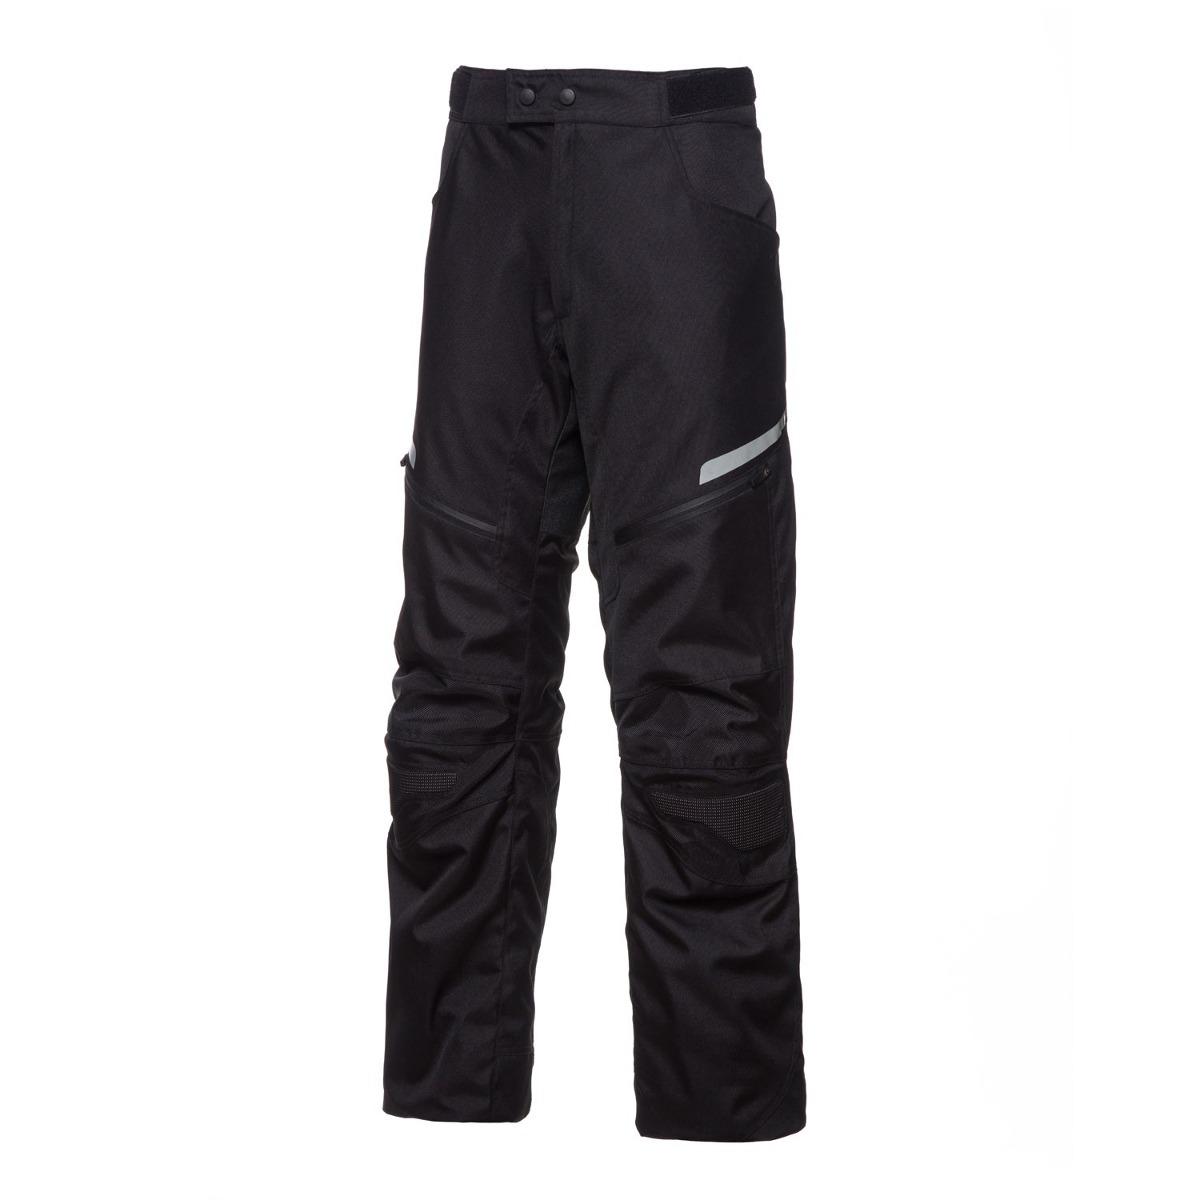 pantalon cordura fuse nineTOone by ls2 negro talle xxl